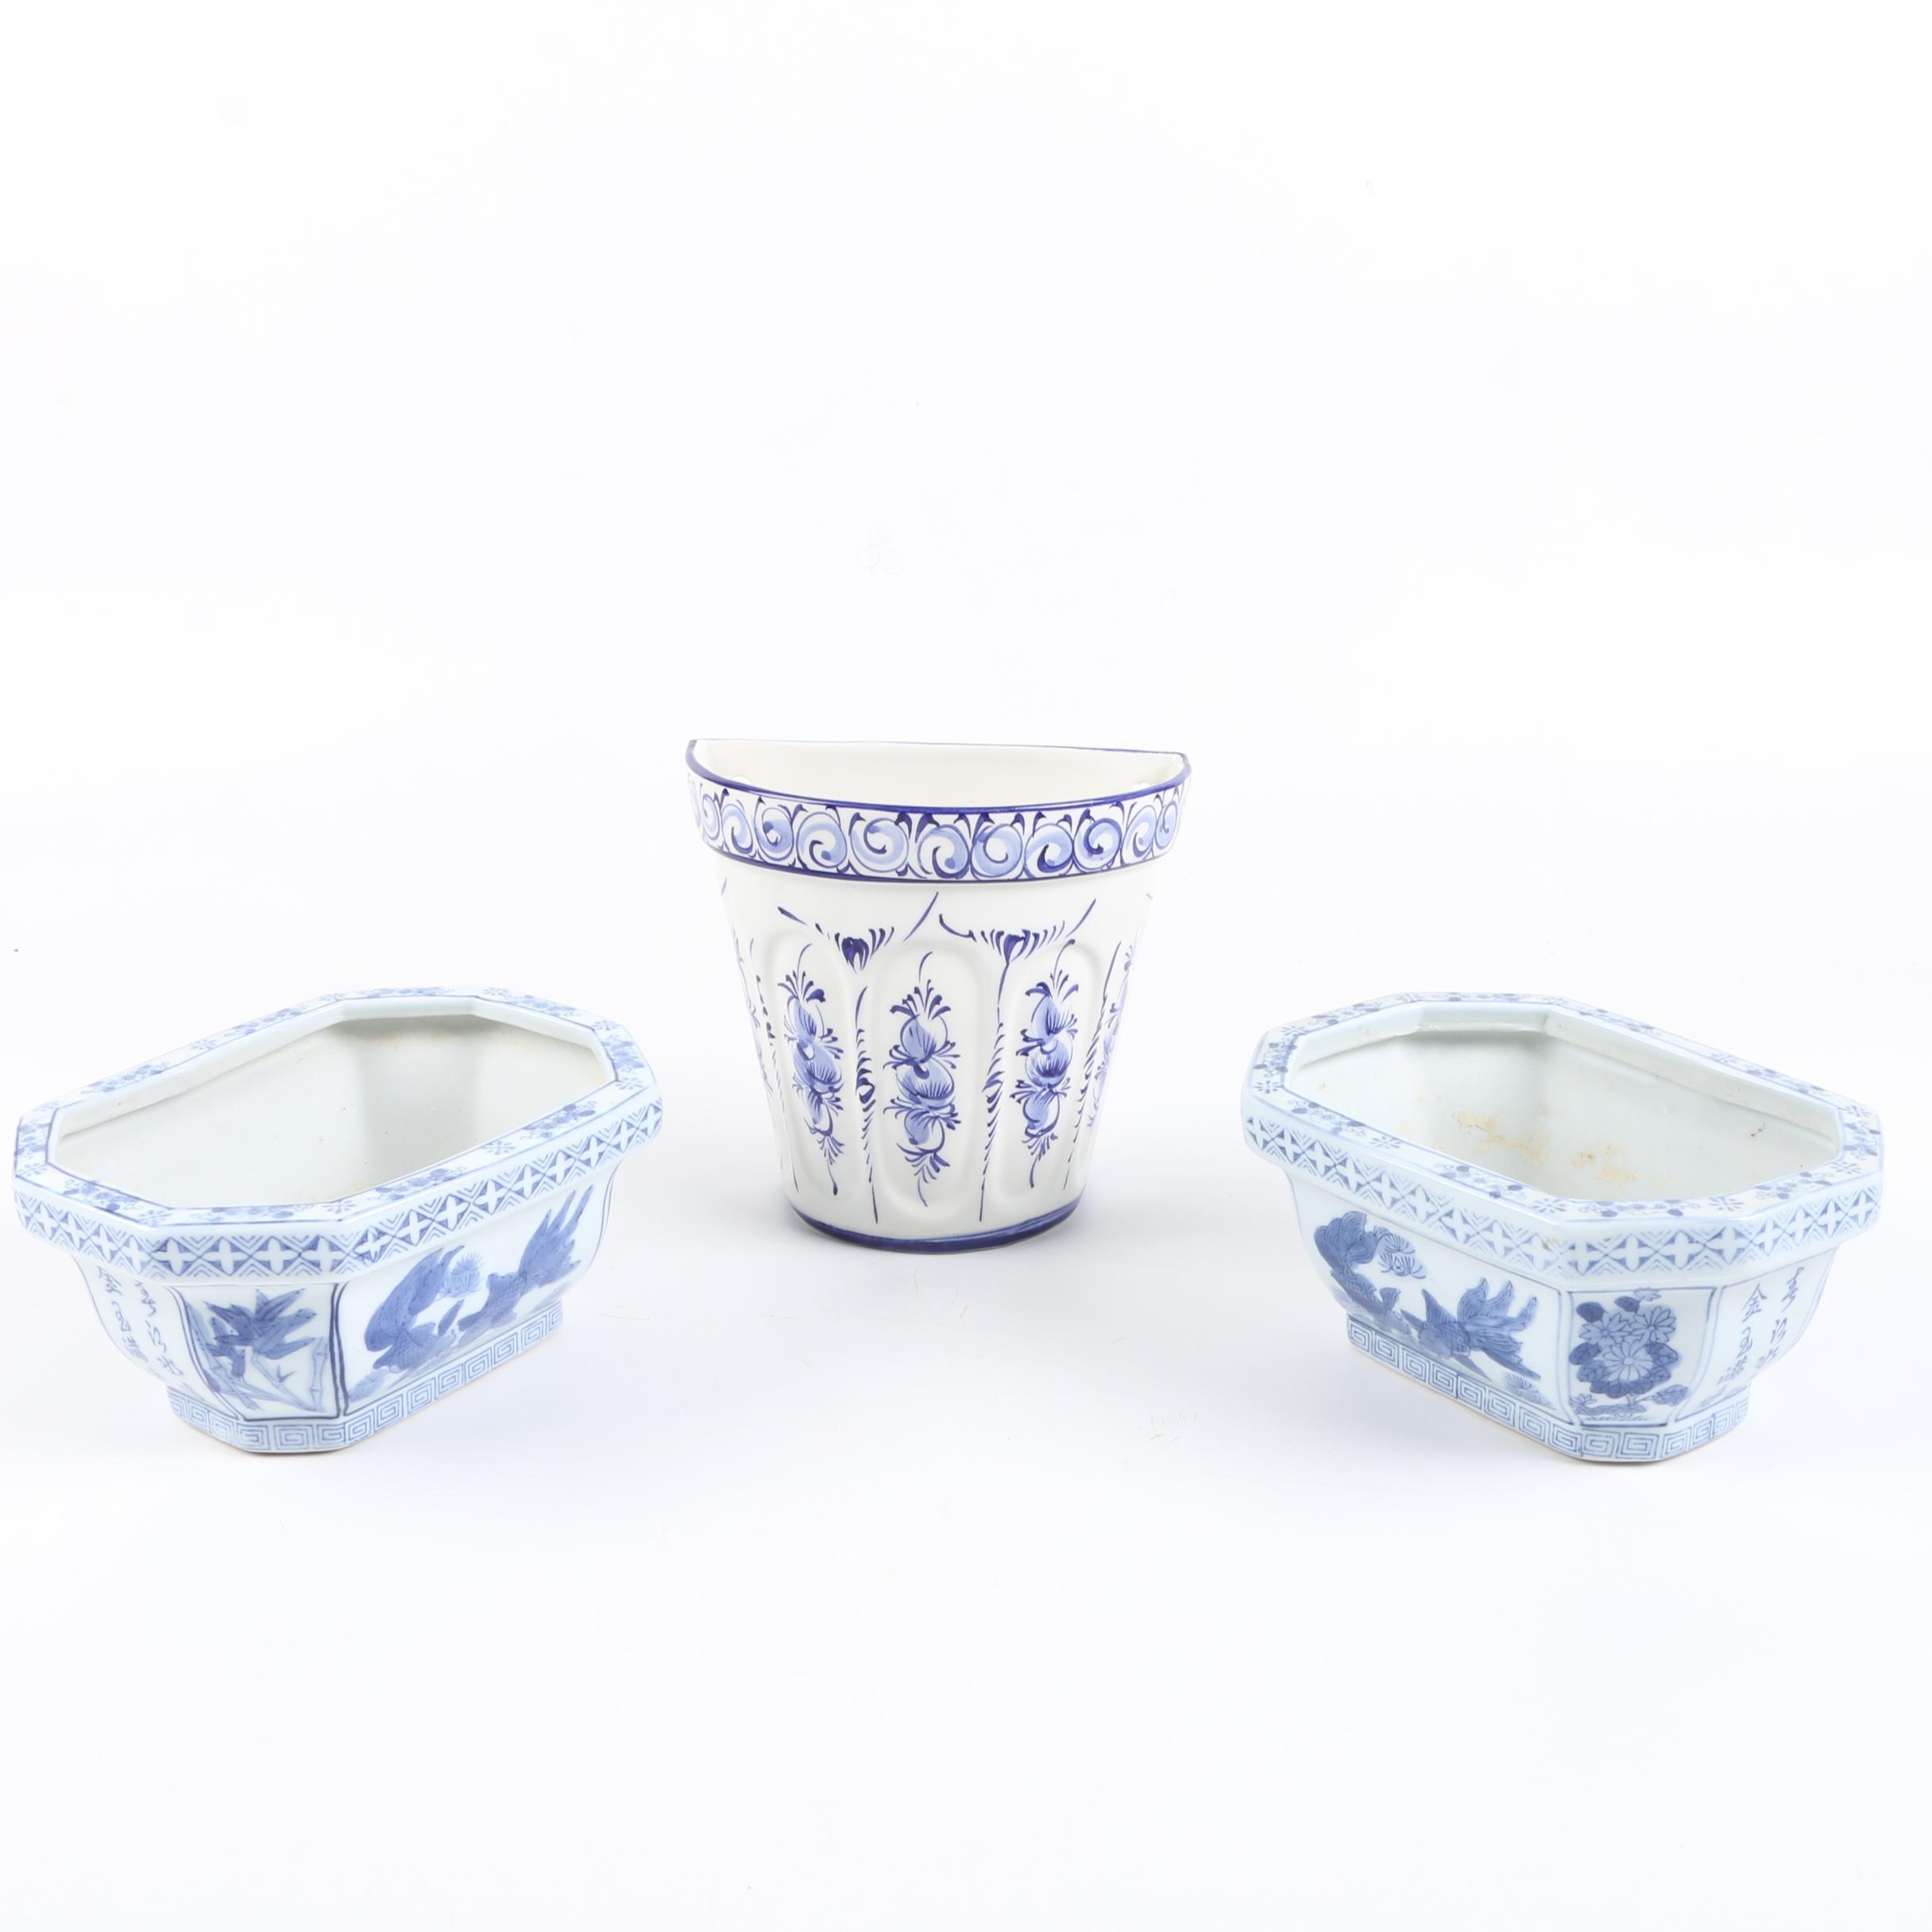 White and Blue Ceramic Planters